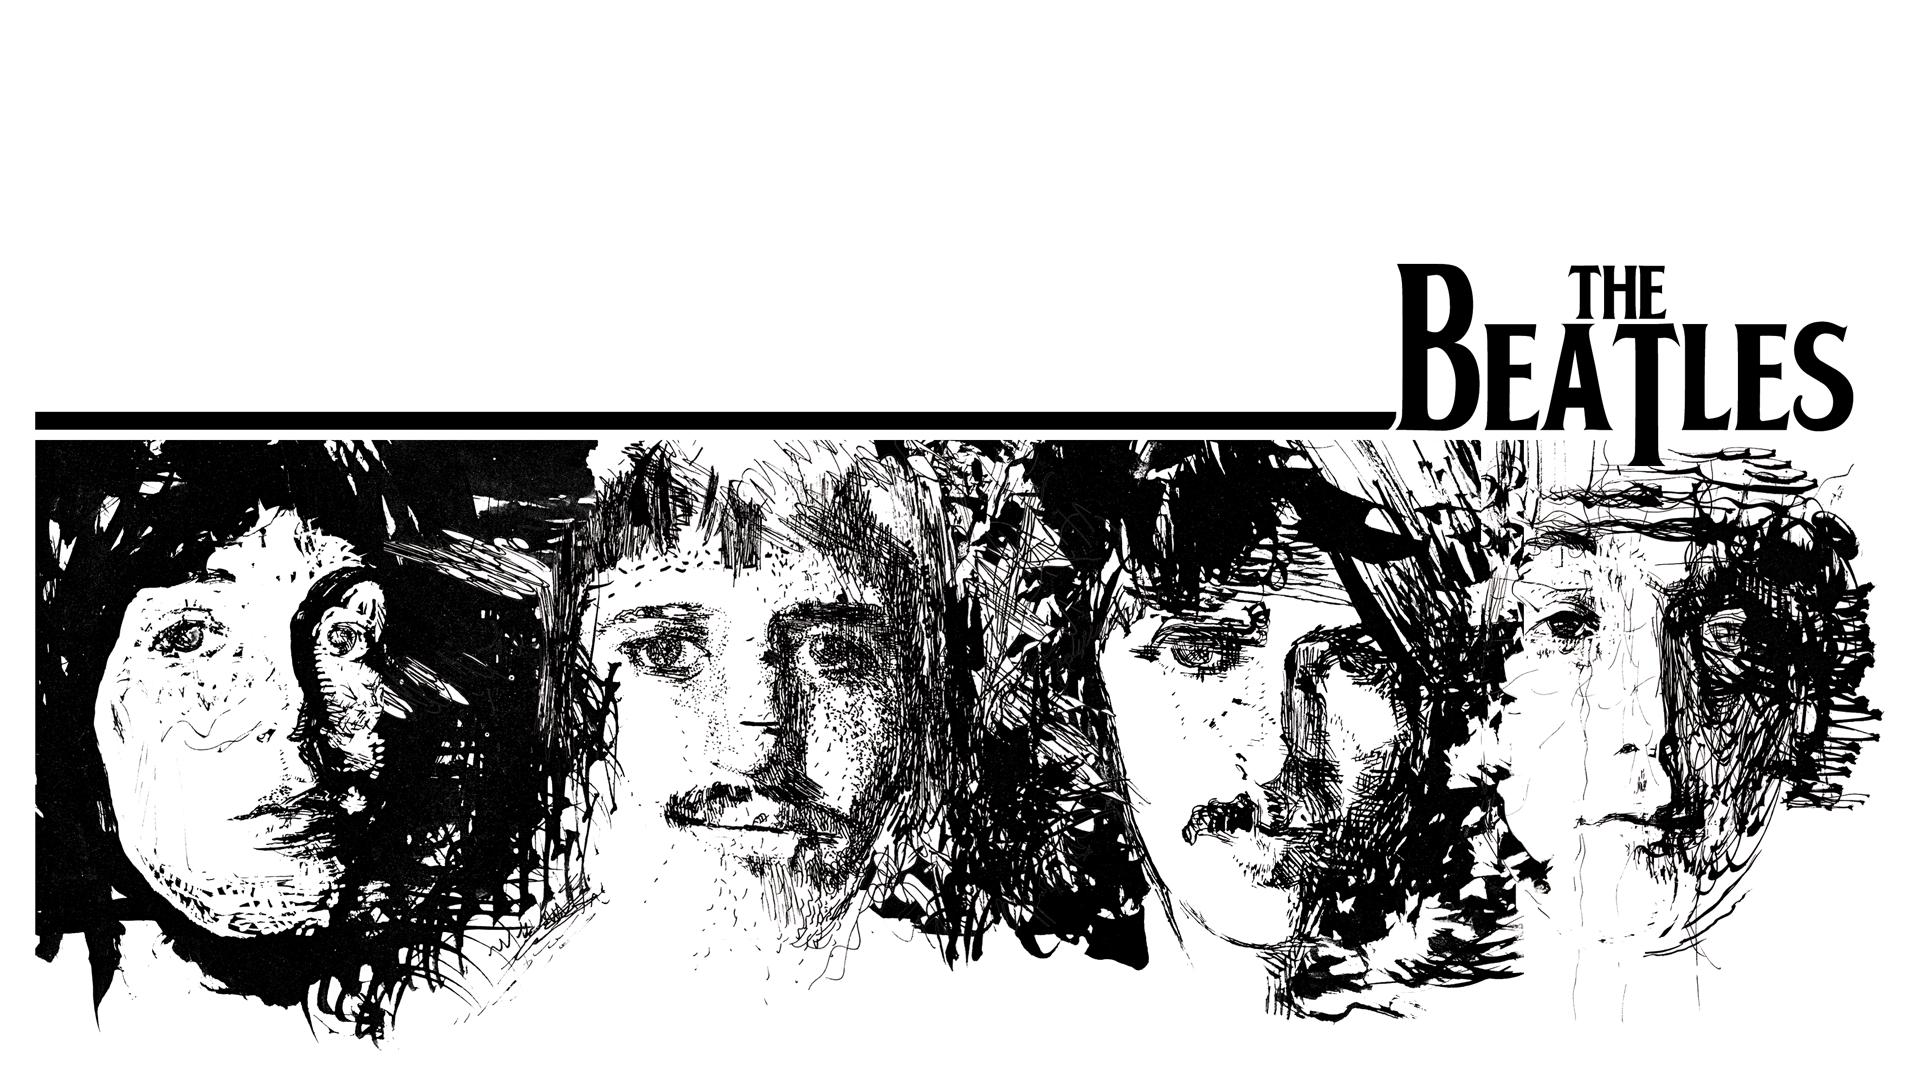 Google Image Result For Http Www Deviantart Com Download 148076110 Beatles Wallpaper By Habatares Png Beatles Wallpaper Beatles Art Beatles Artwork